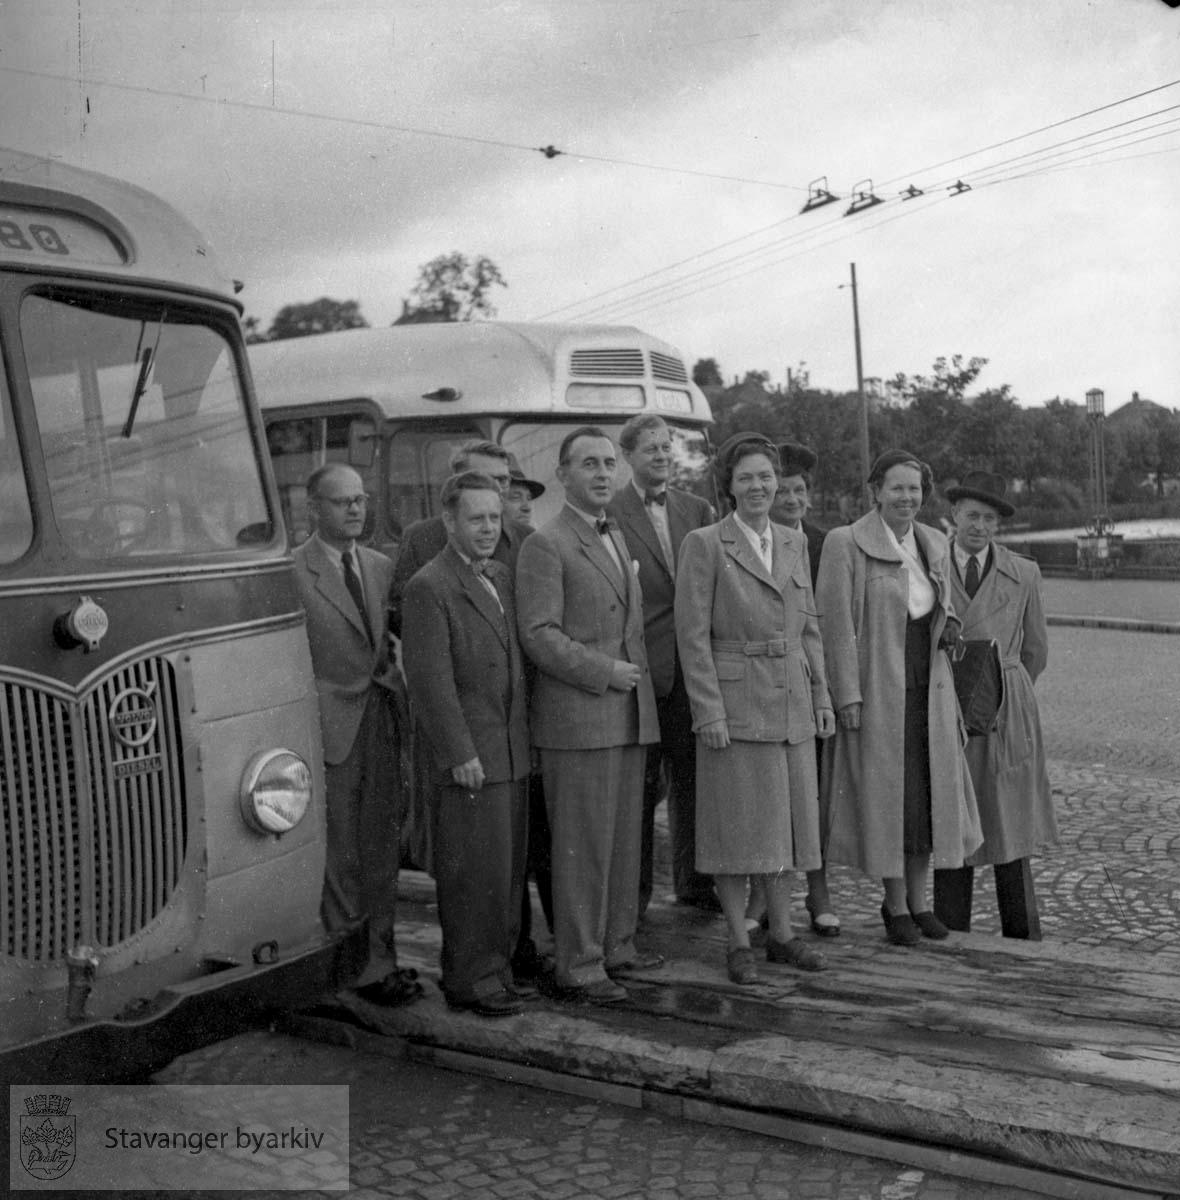 Per Thomsen foran til venstre (med sløyfe)